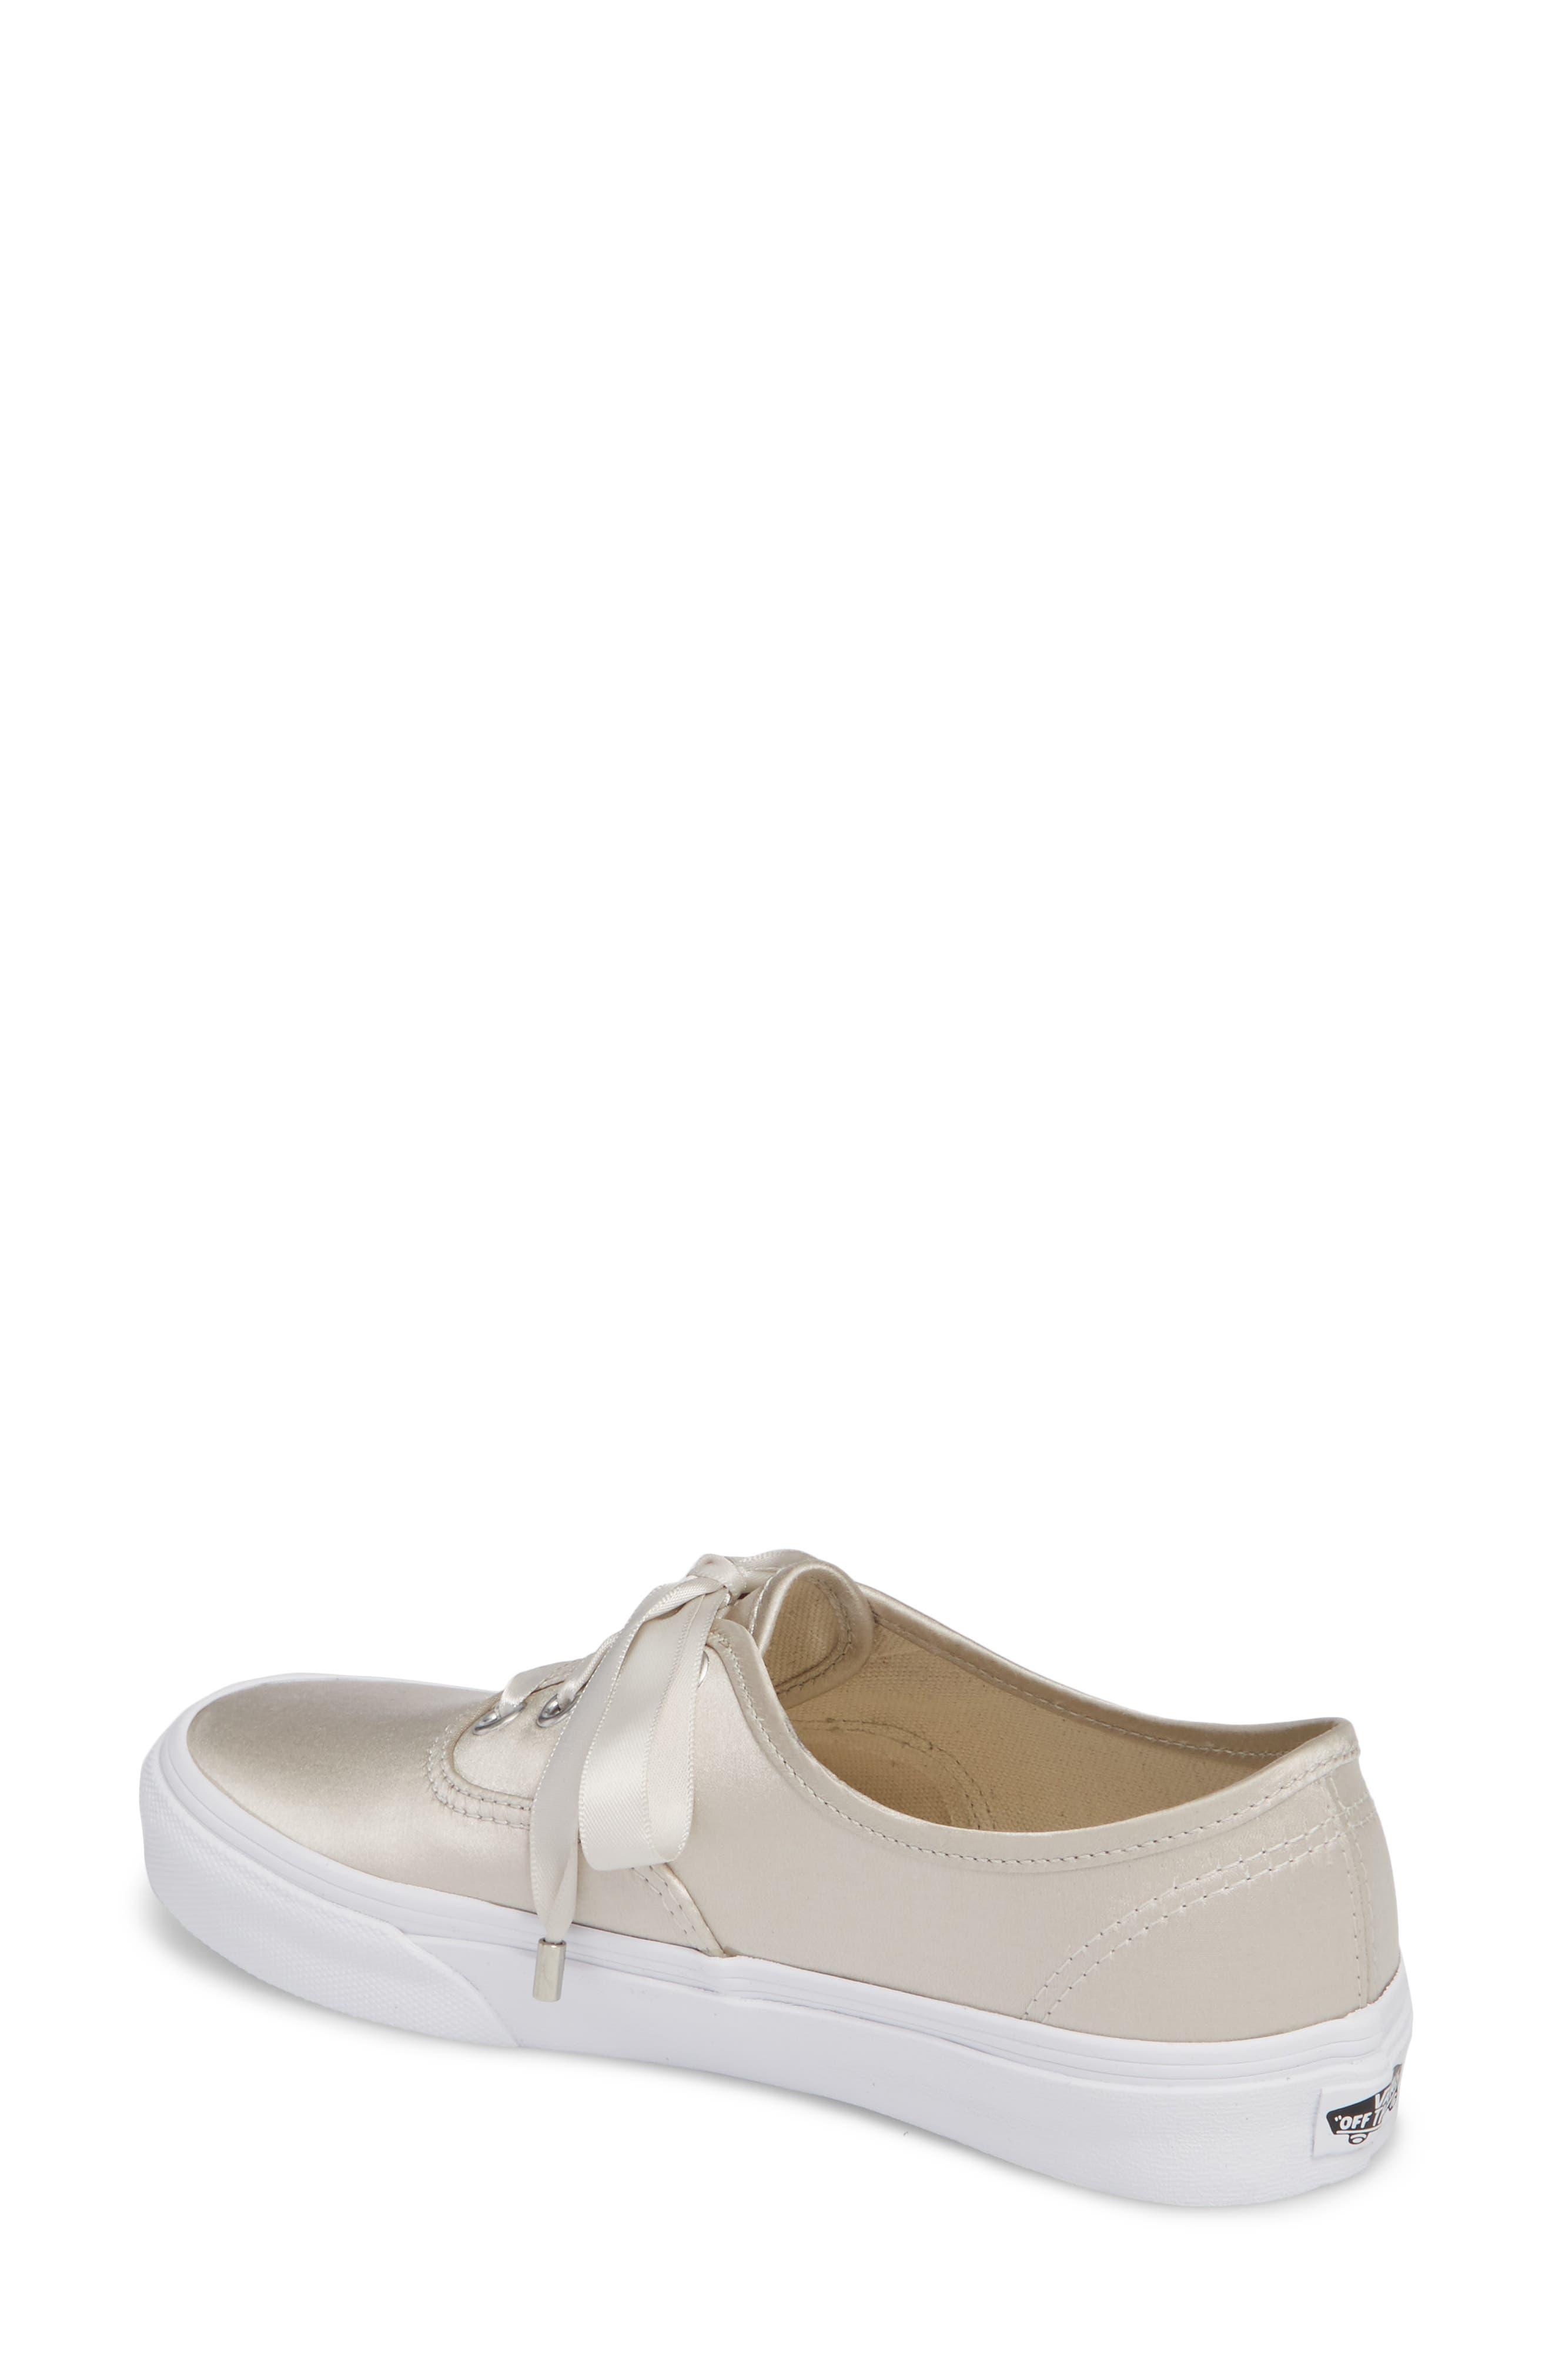 ,                             'Authentic' Sneaker,                             Alternate thumbnail 184, color,                             040